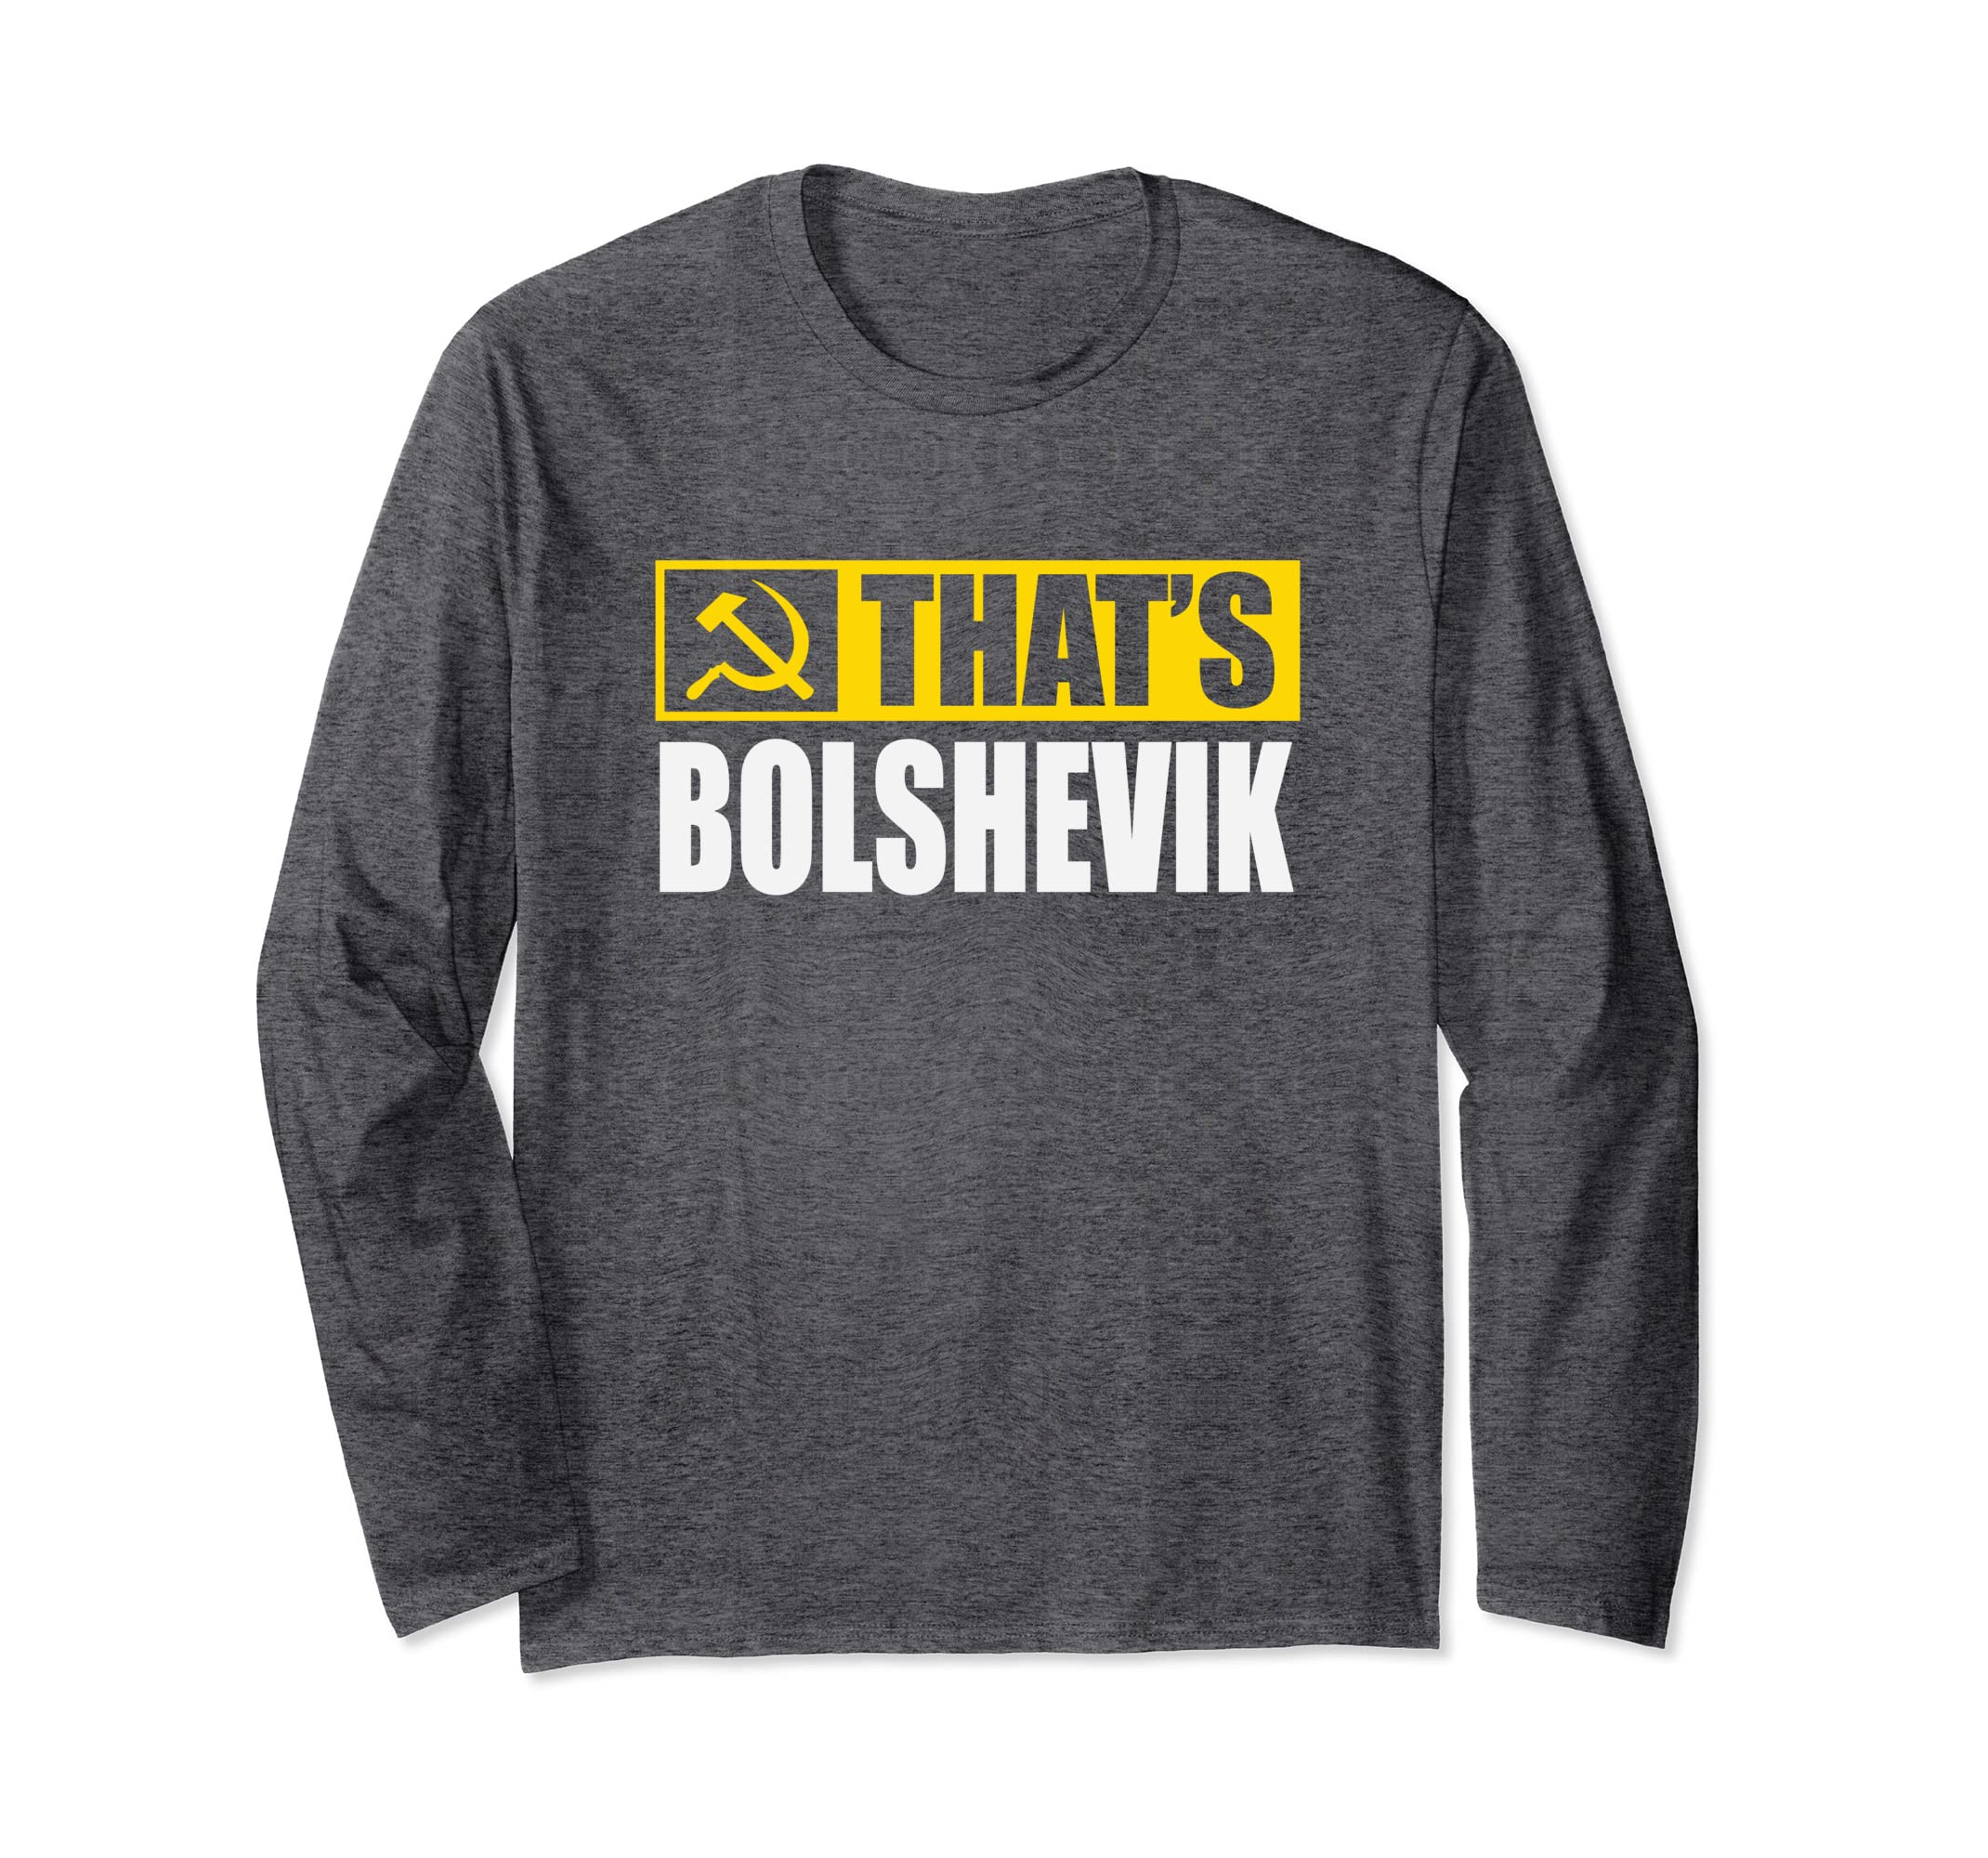 ffaeacf07e3 Amazon.com: That's Bolshevik USSR Russian Hammer And Sickle Long Sleeve:  Clothing